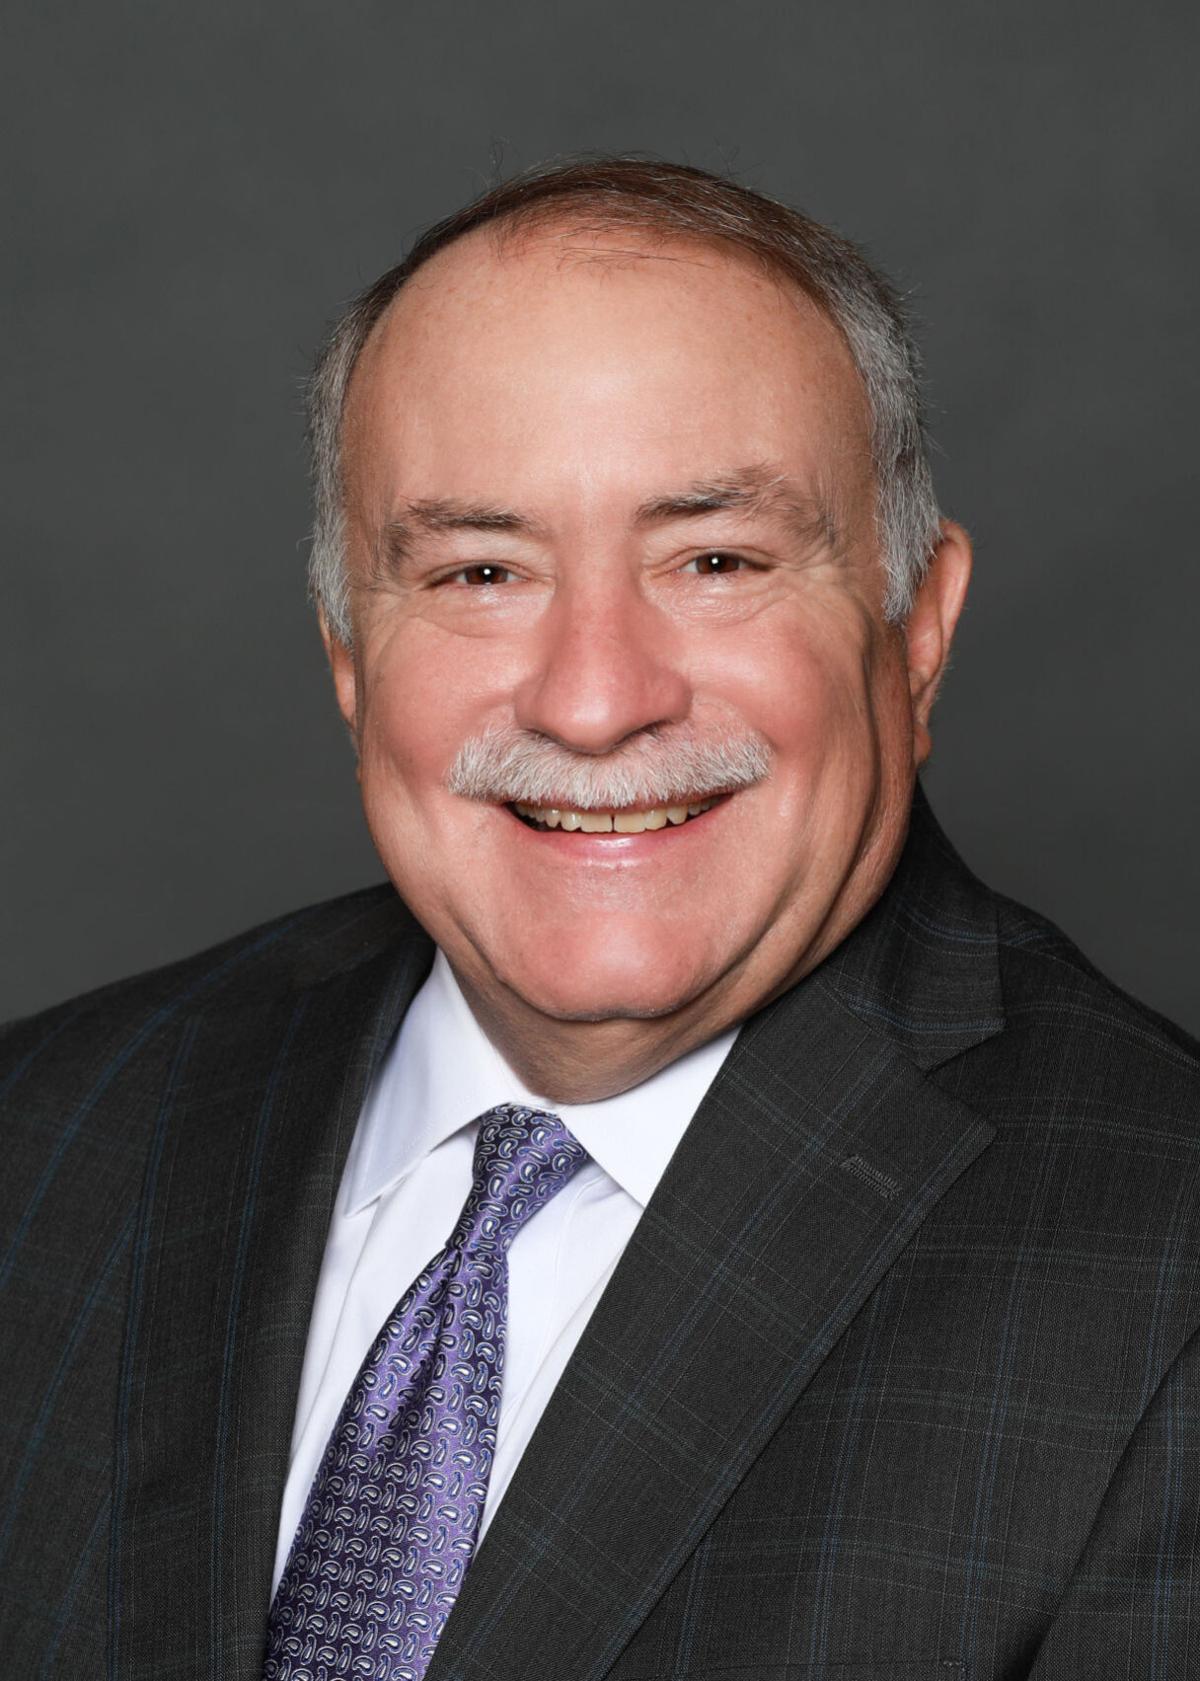 Rep. Brent Siegrist, R-Council Bluffs